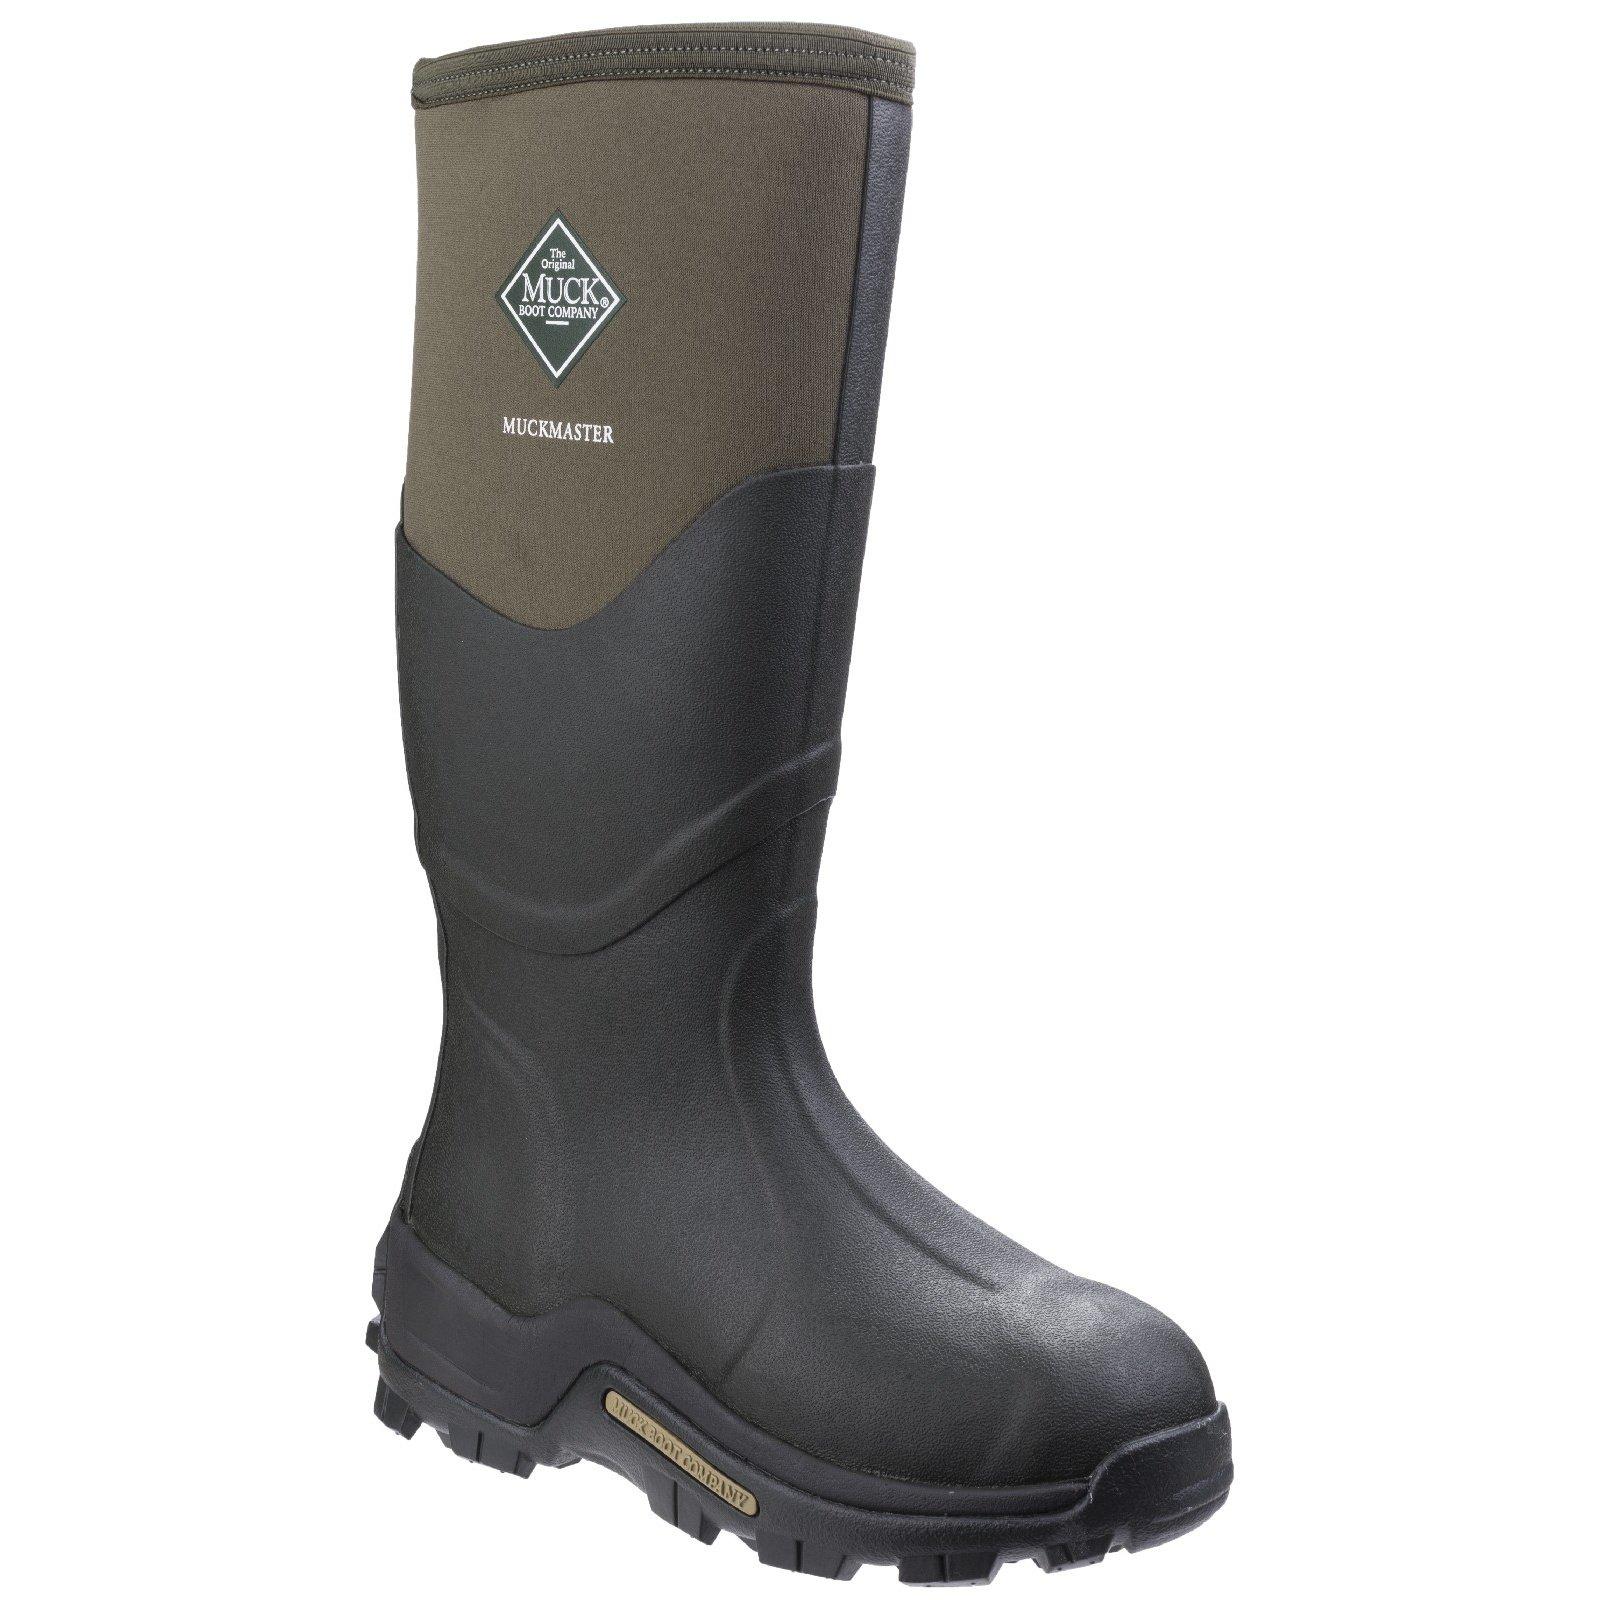 Muck Boot Unisex Muckmaster Hi Wellington Boots (11 M US / 12 W US) (Moss/Moss) by Muck Boot